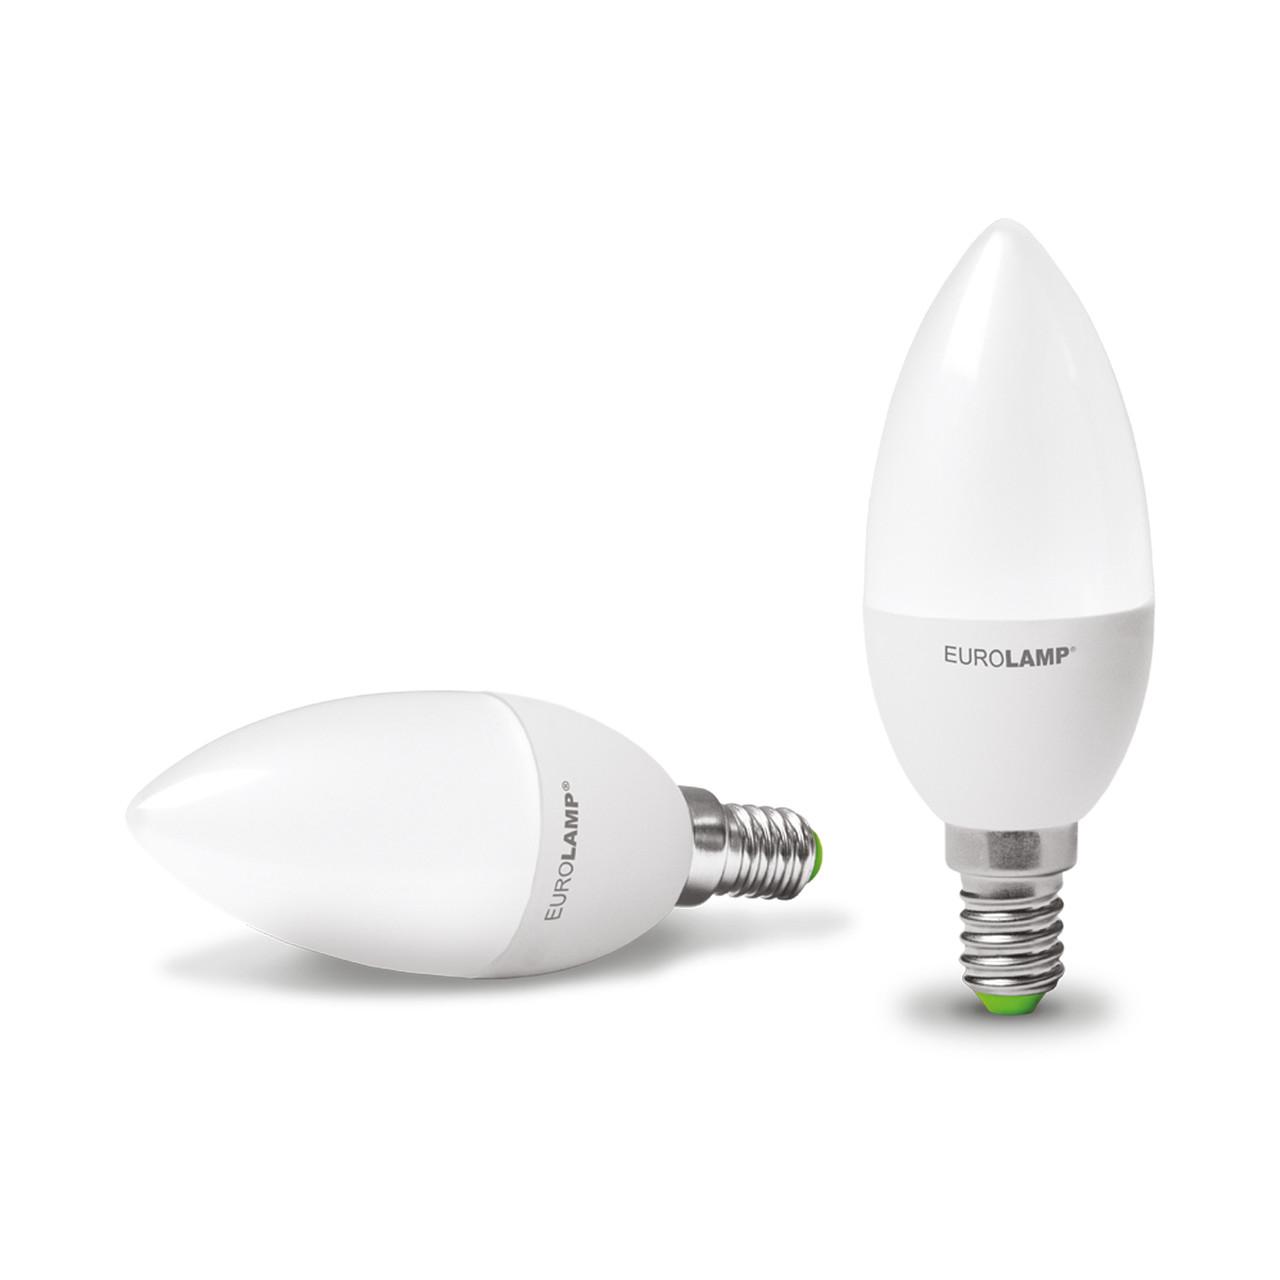 EUROLAMP LED Лампа ЕКО Свеча 6W E14 4000K